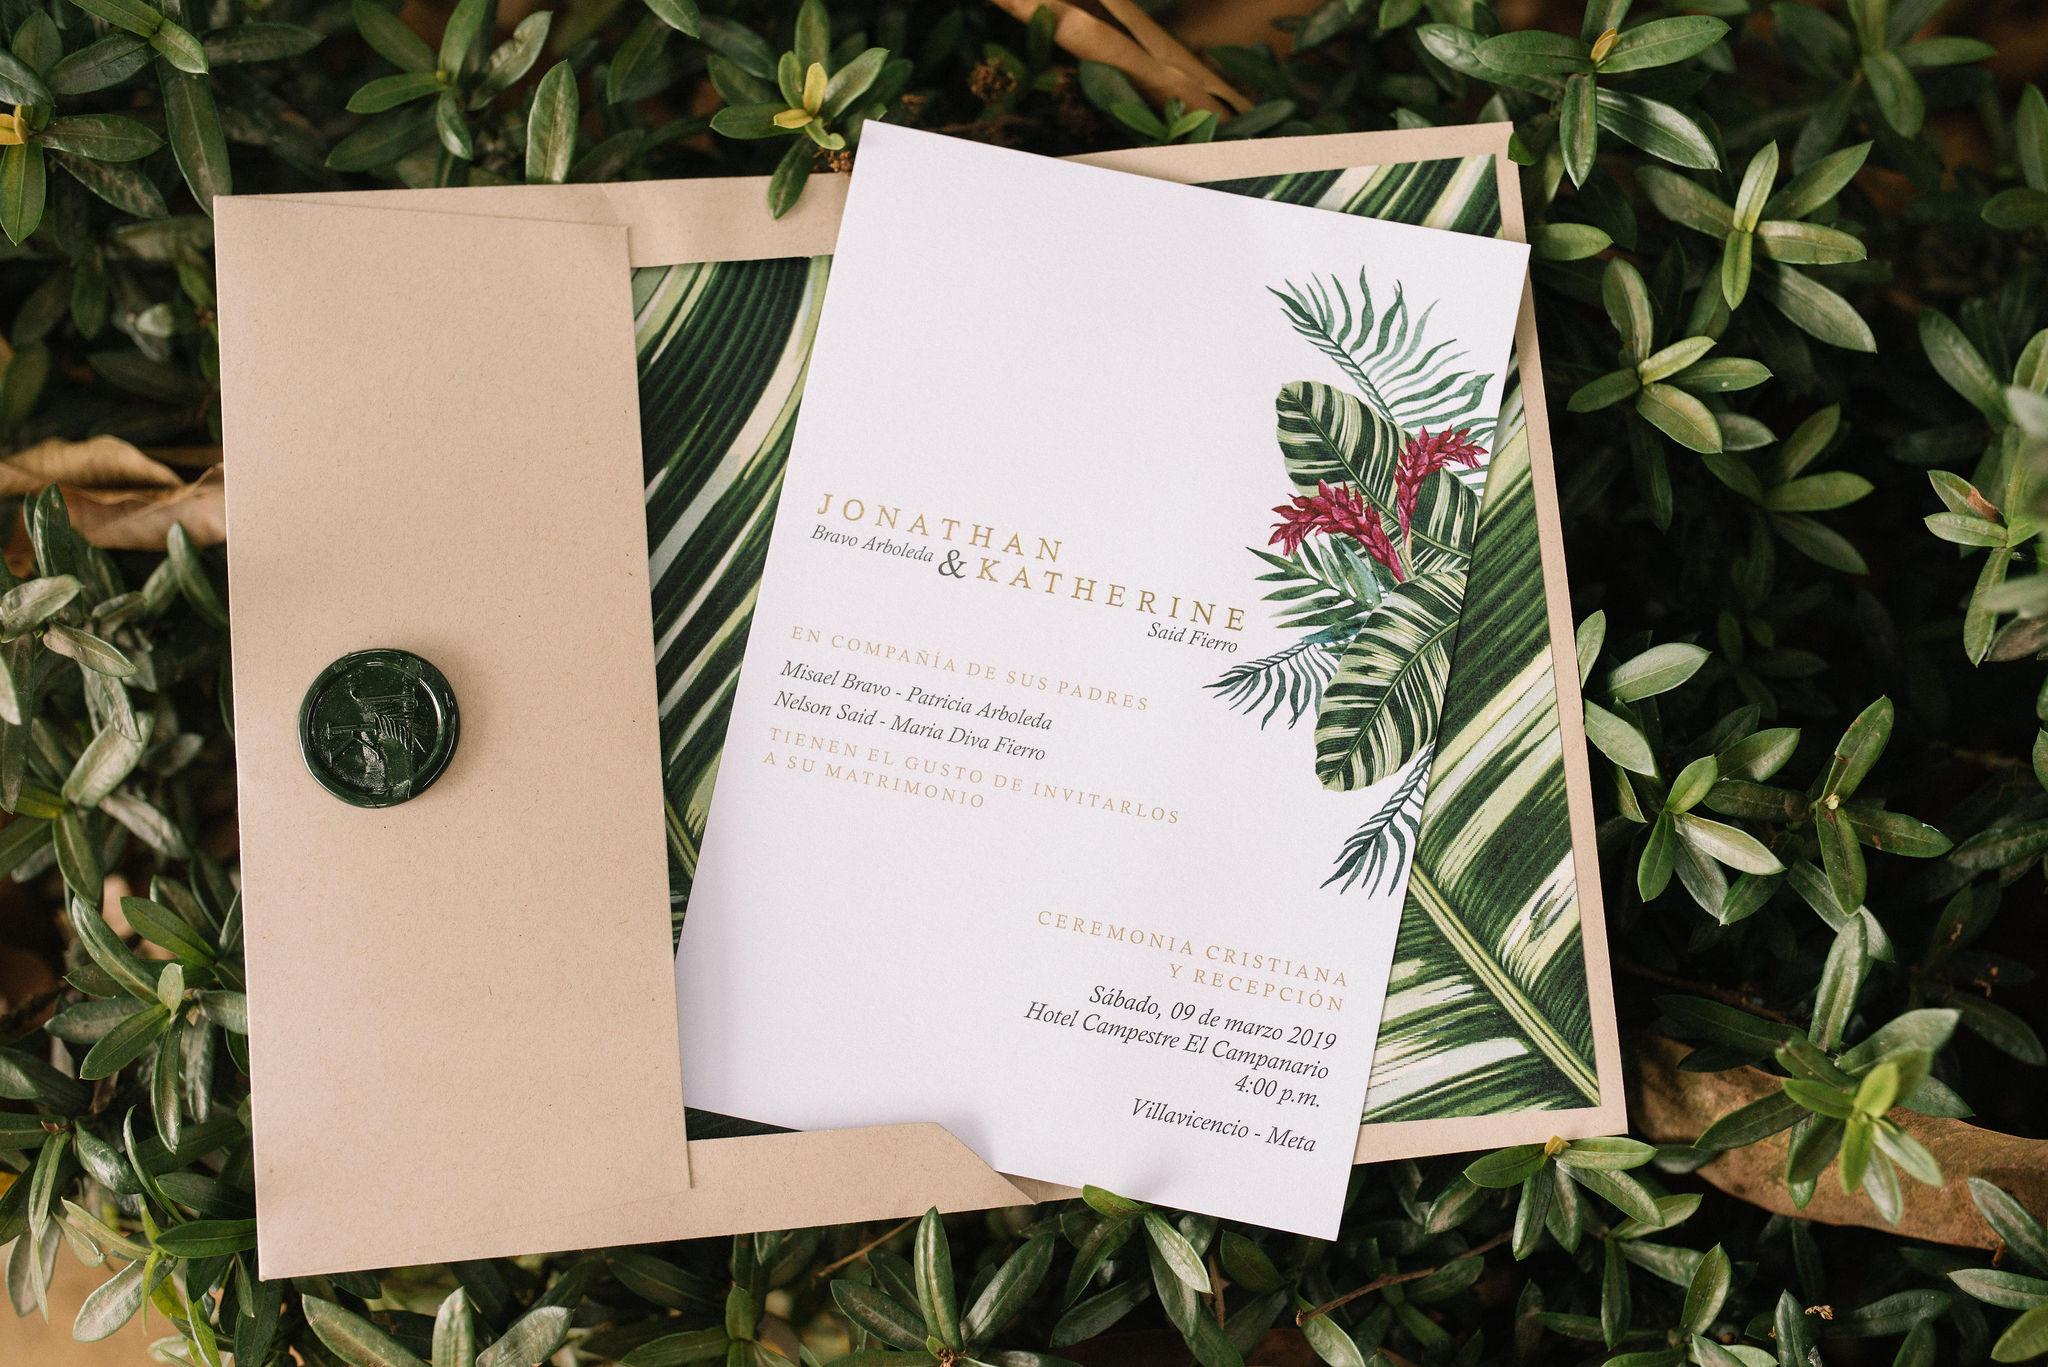 julieth-bravo-wedding-planner-invitacion-wedding-destination-destino-boda-villavicencio-hotelcampanario-paperiebakery-weddinginvitation-love-bogota-miami.jpg